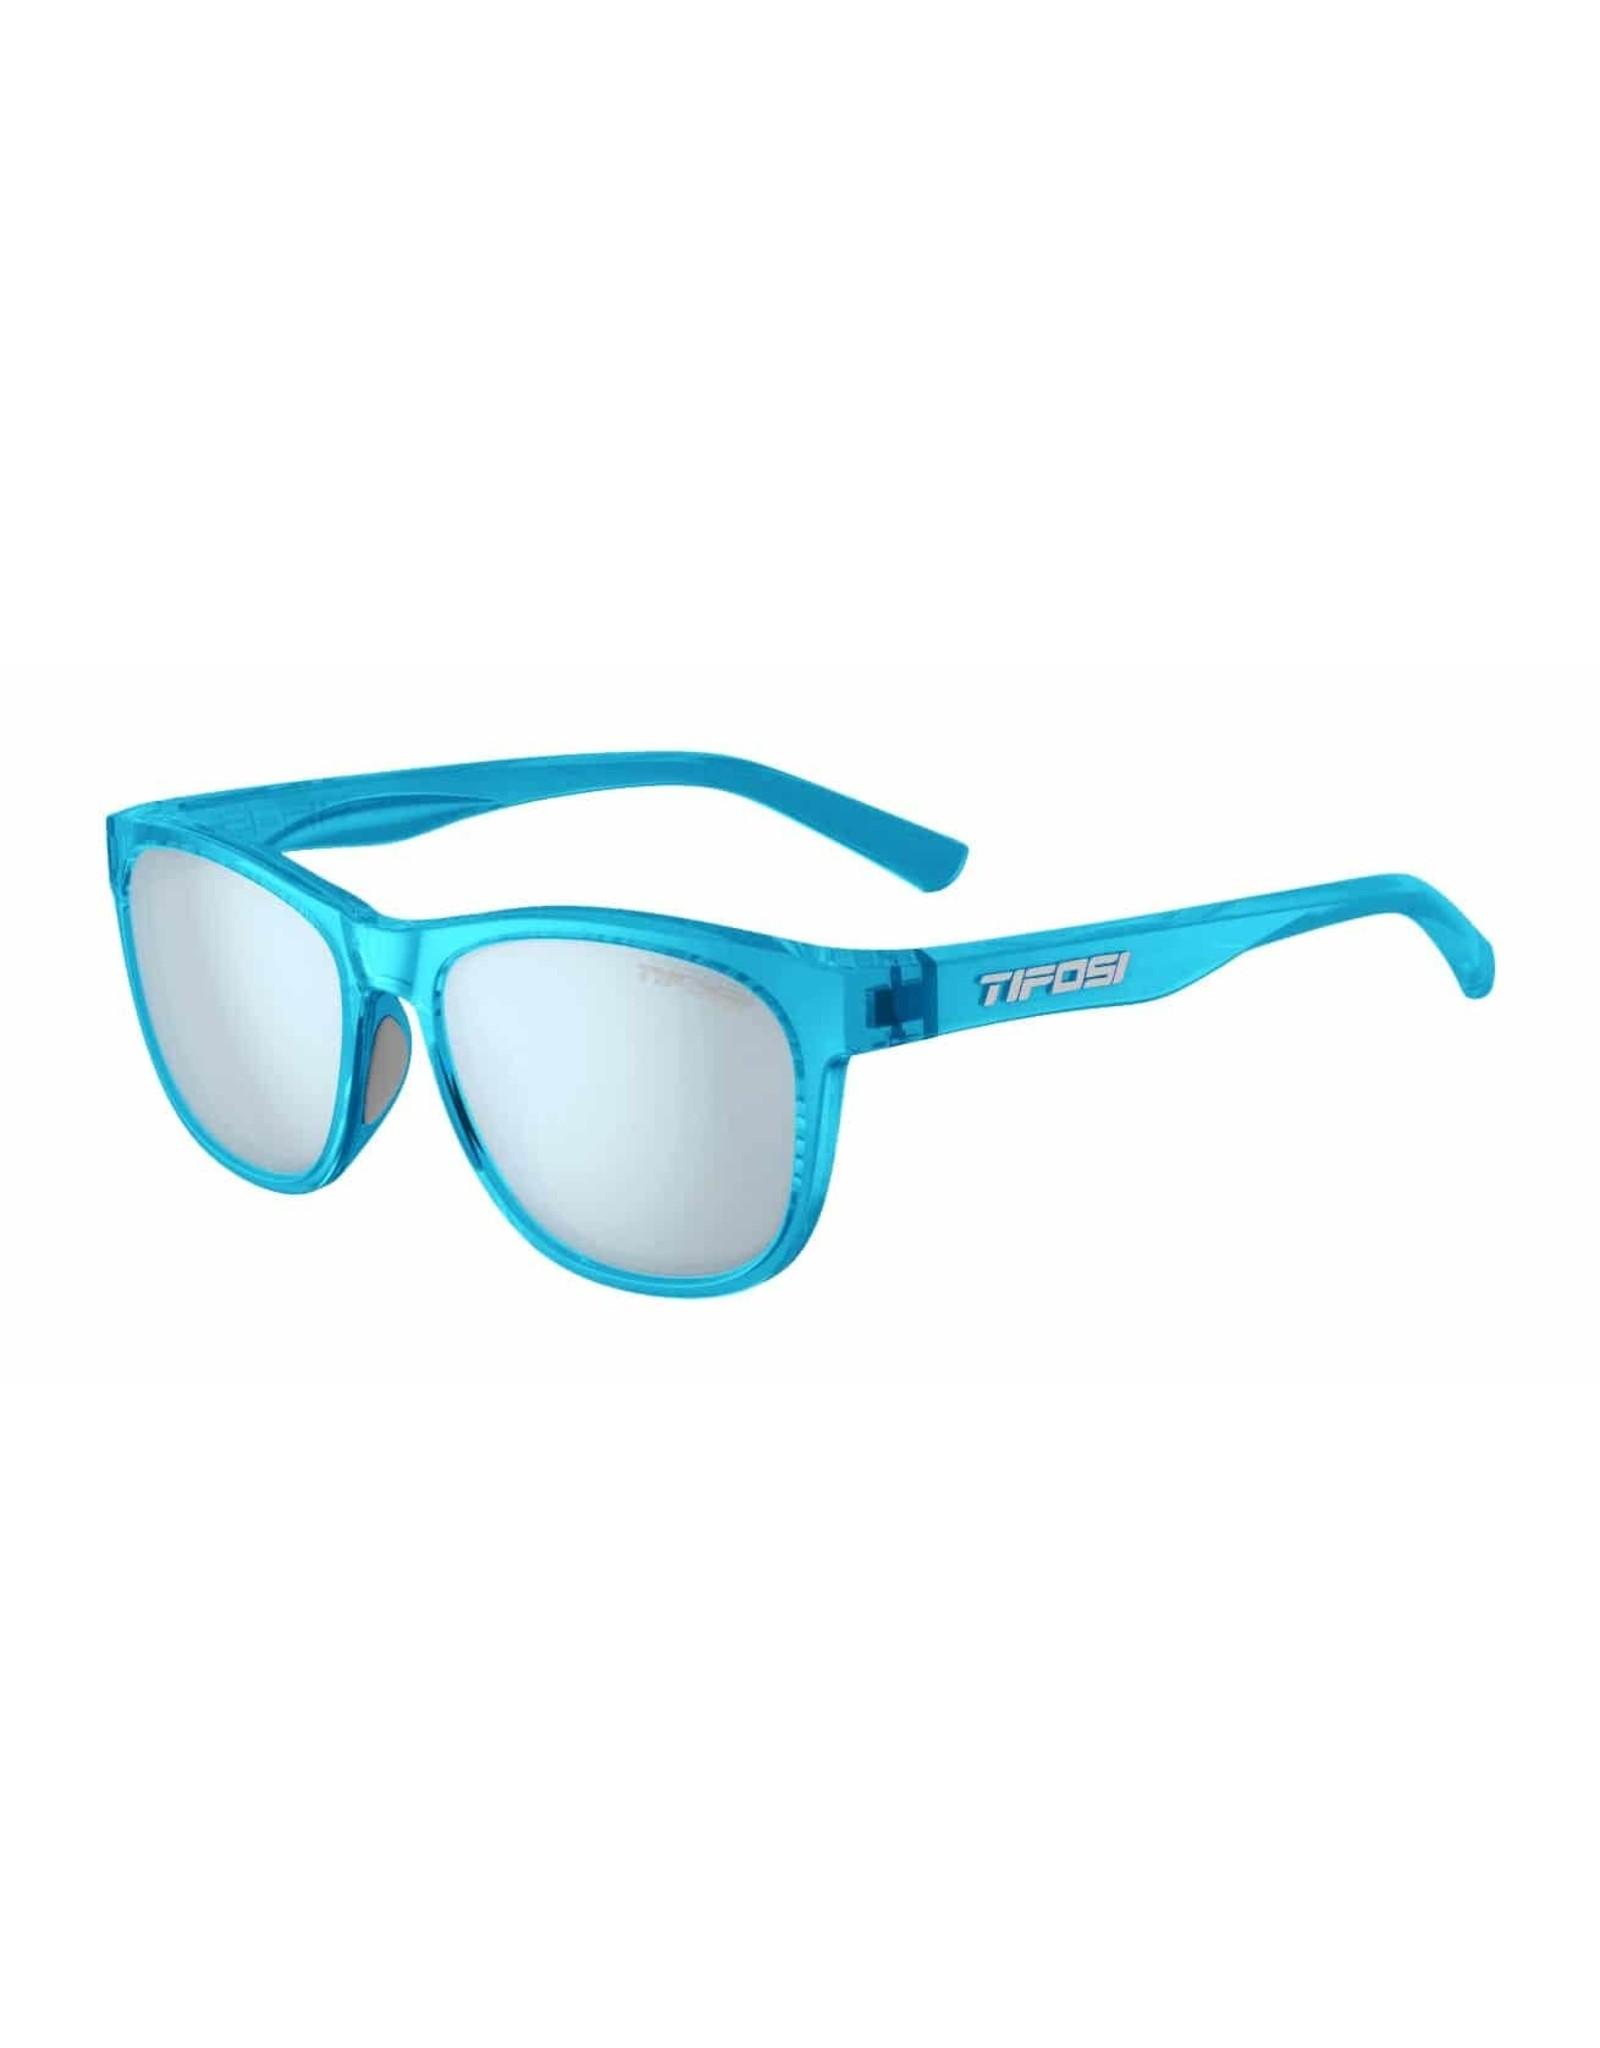 Tifosi Optics Tifosi Swank Crystal Sky Blue Glasses